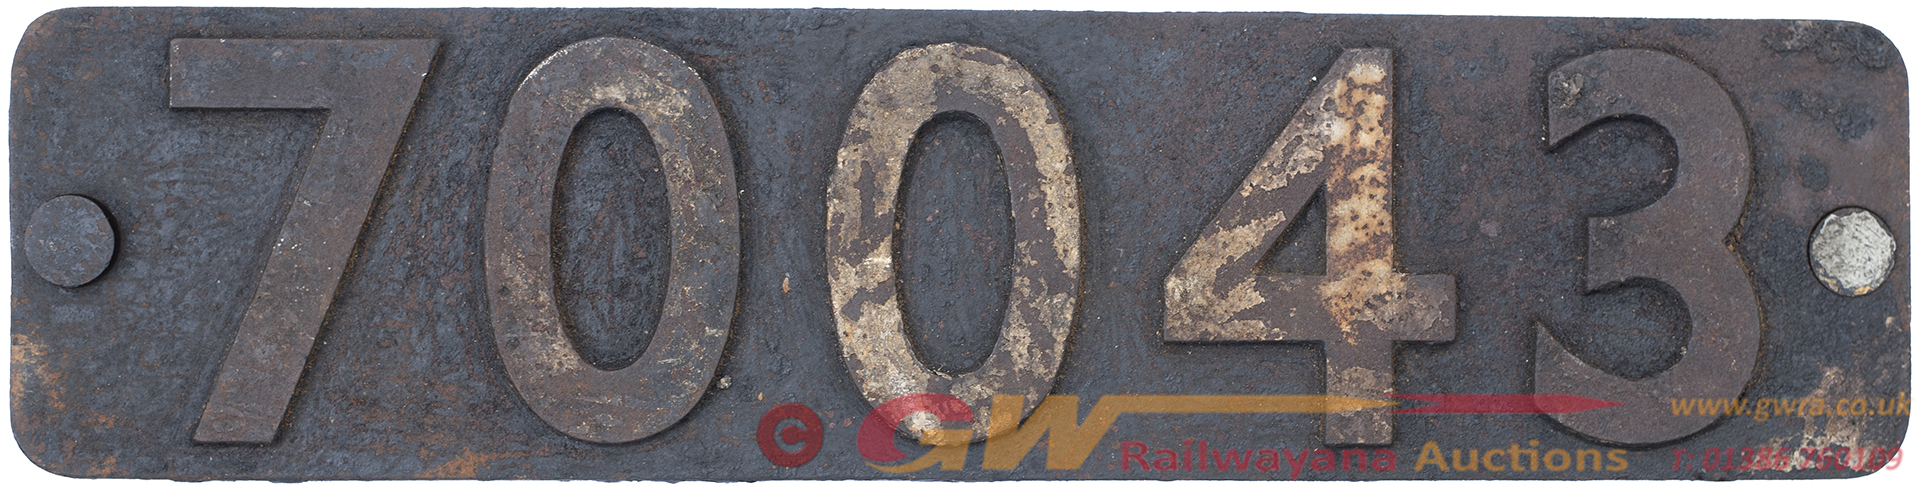 Smokebox Numberplate 70043 Ex BR Riddles STD Class